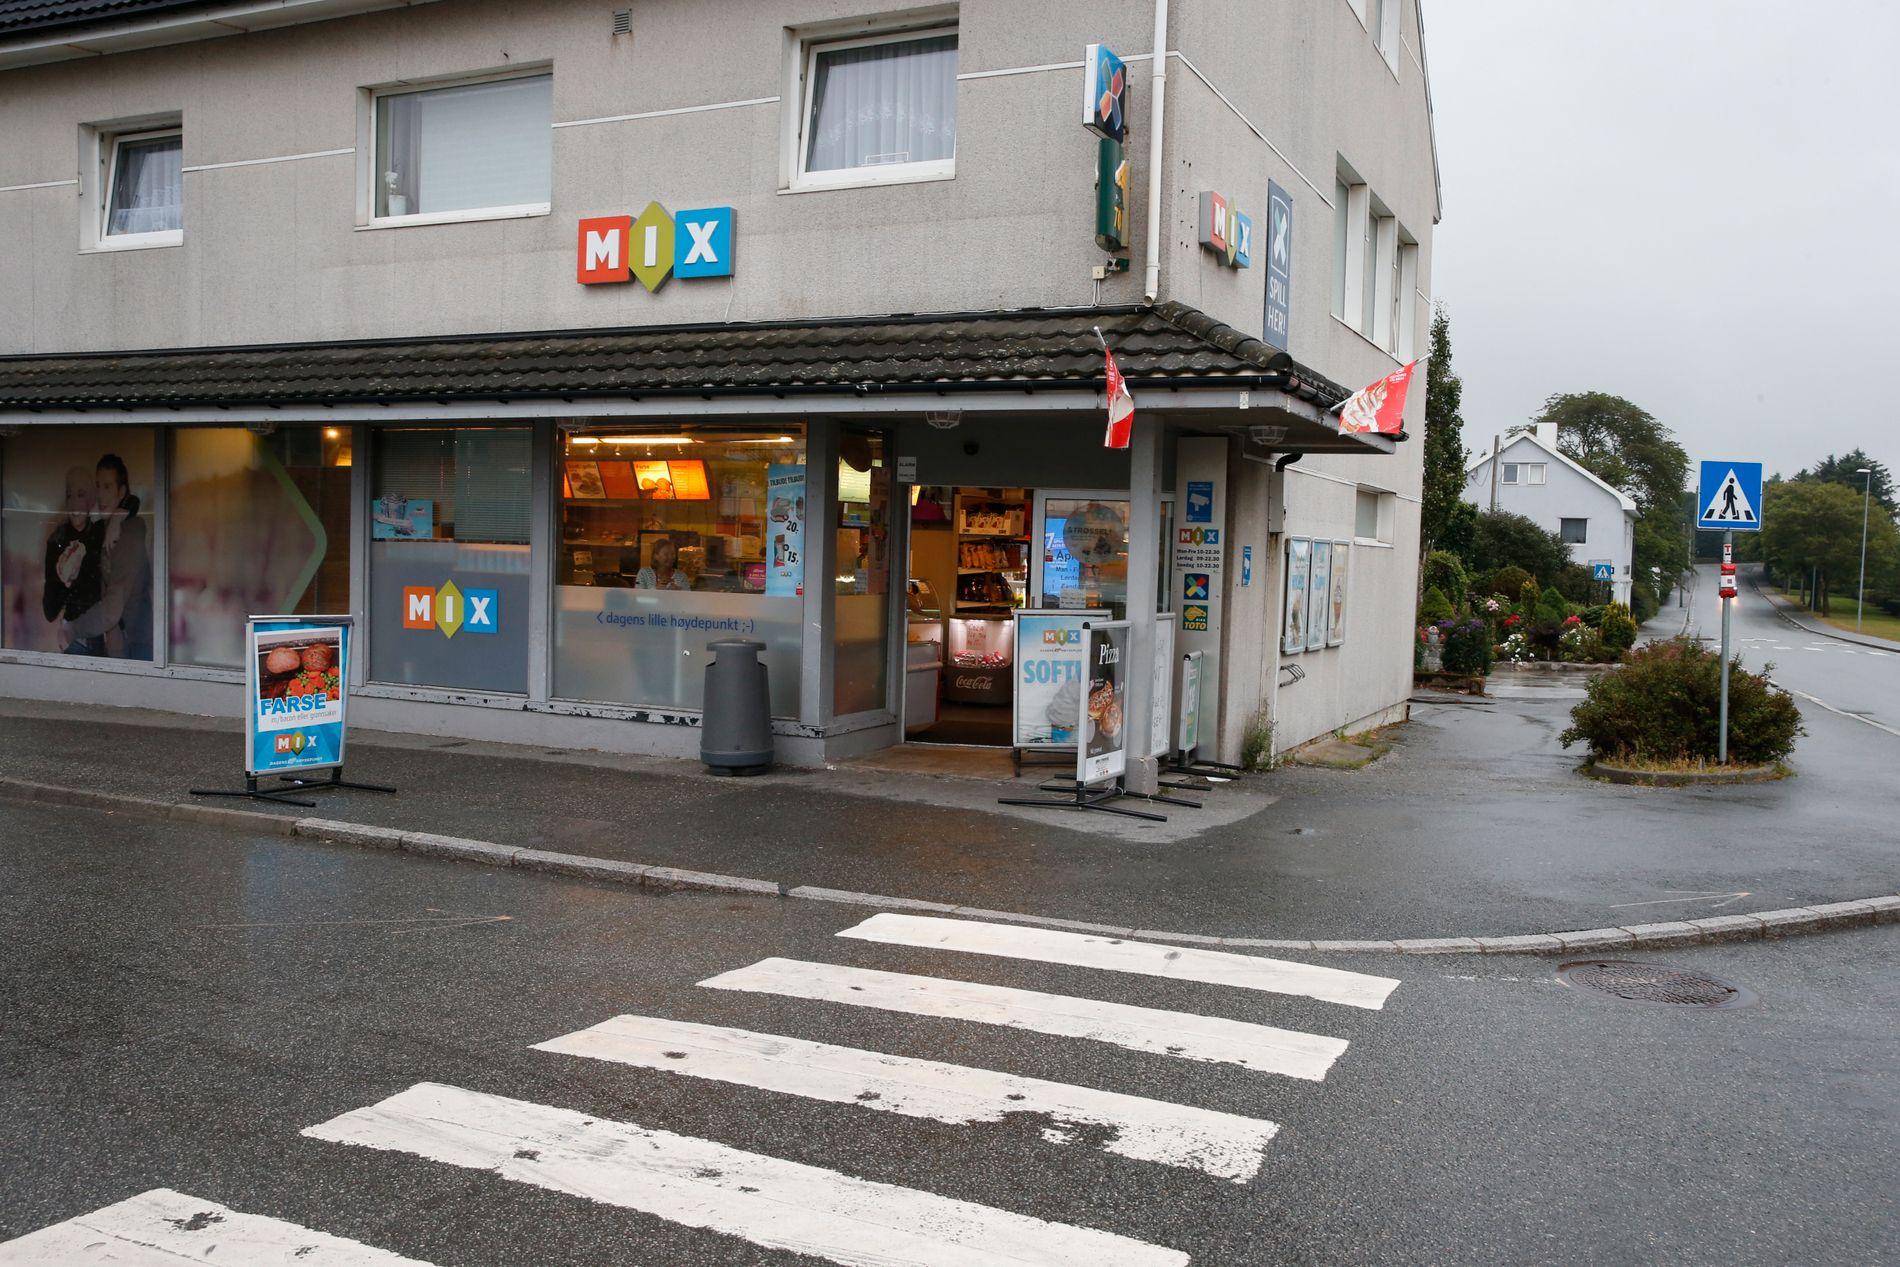 SAMLINGSSTED: Mix-kiosken på Varhaug er et populært samlingssted for mange unge.